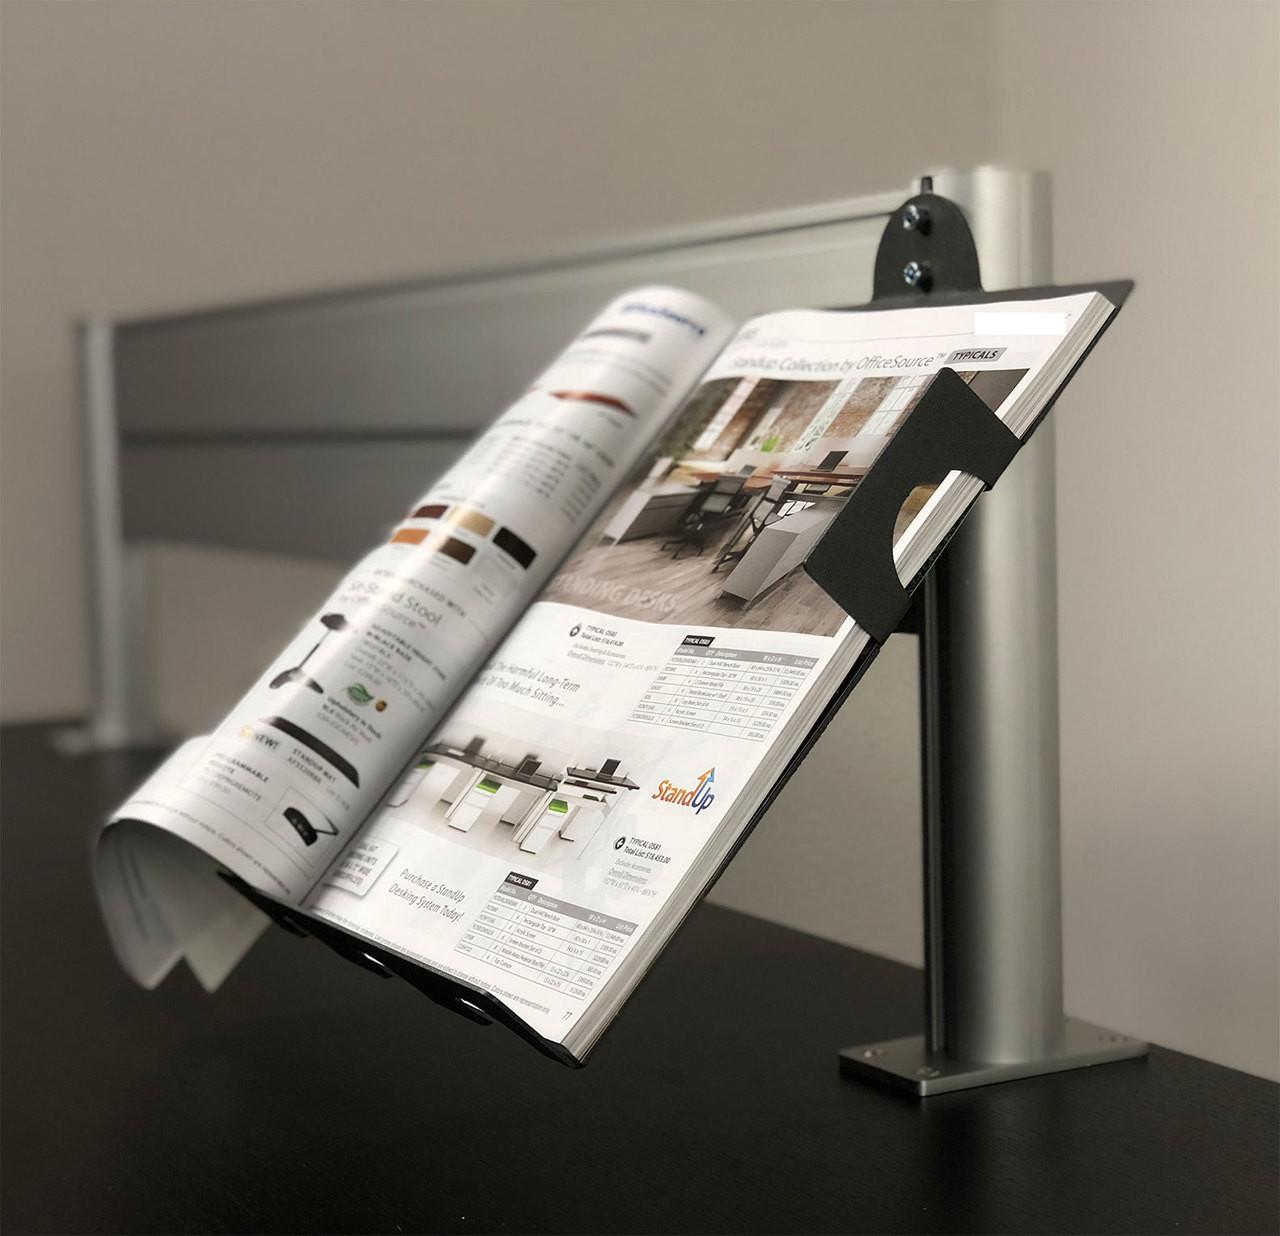 Literature / IPOD / Phone Holder for Alumium Slate Wall Organzier, #OT-SUL-HANG6